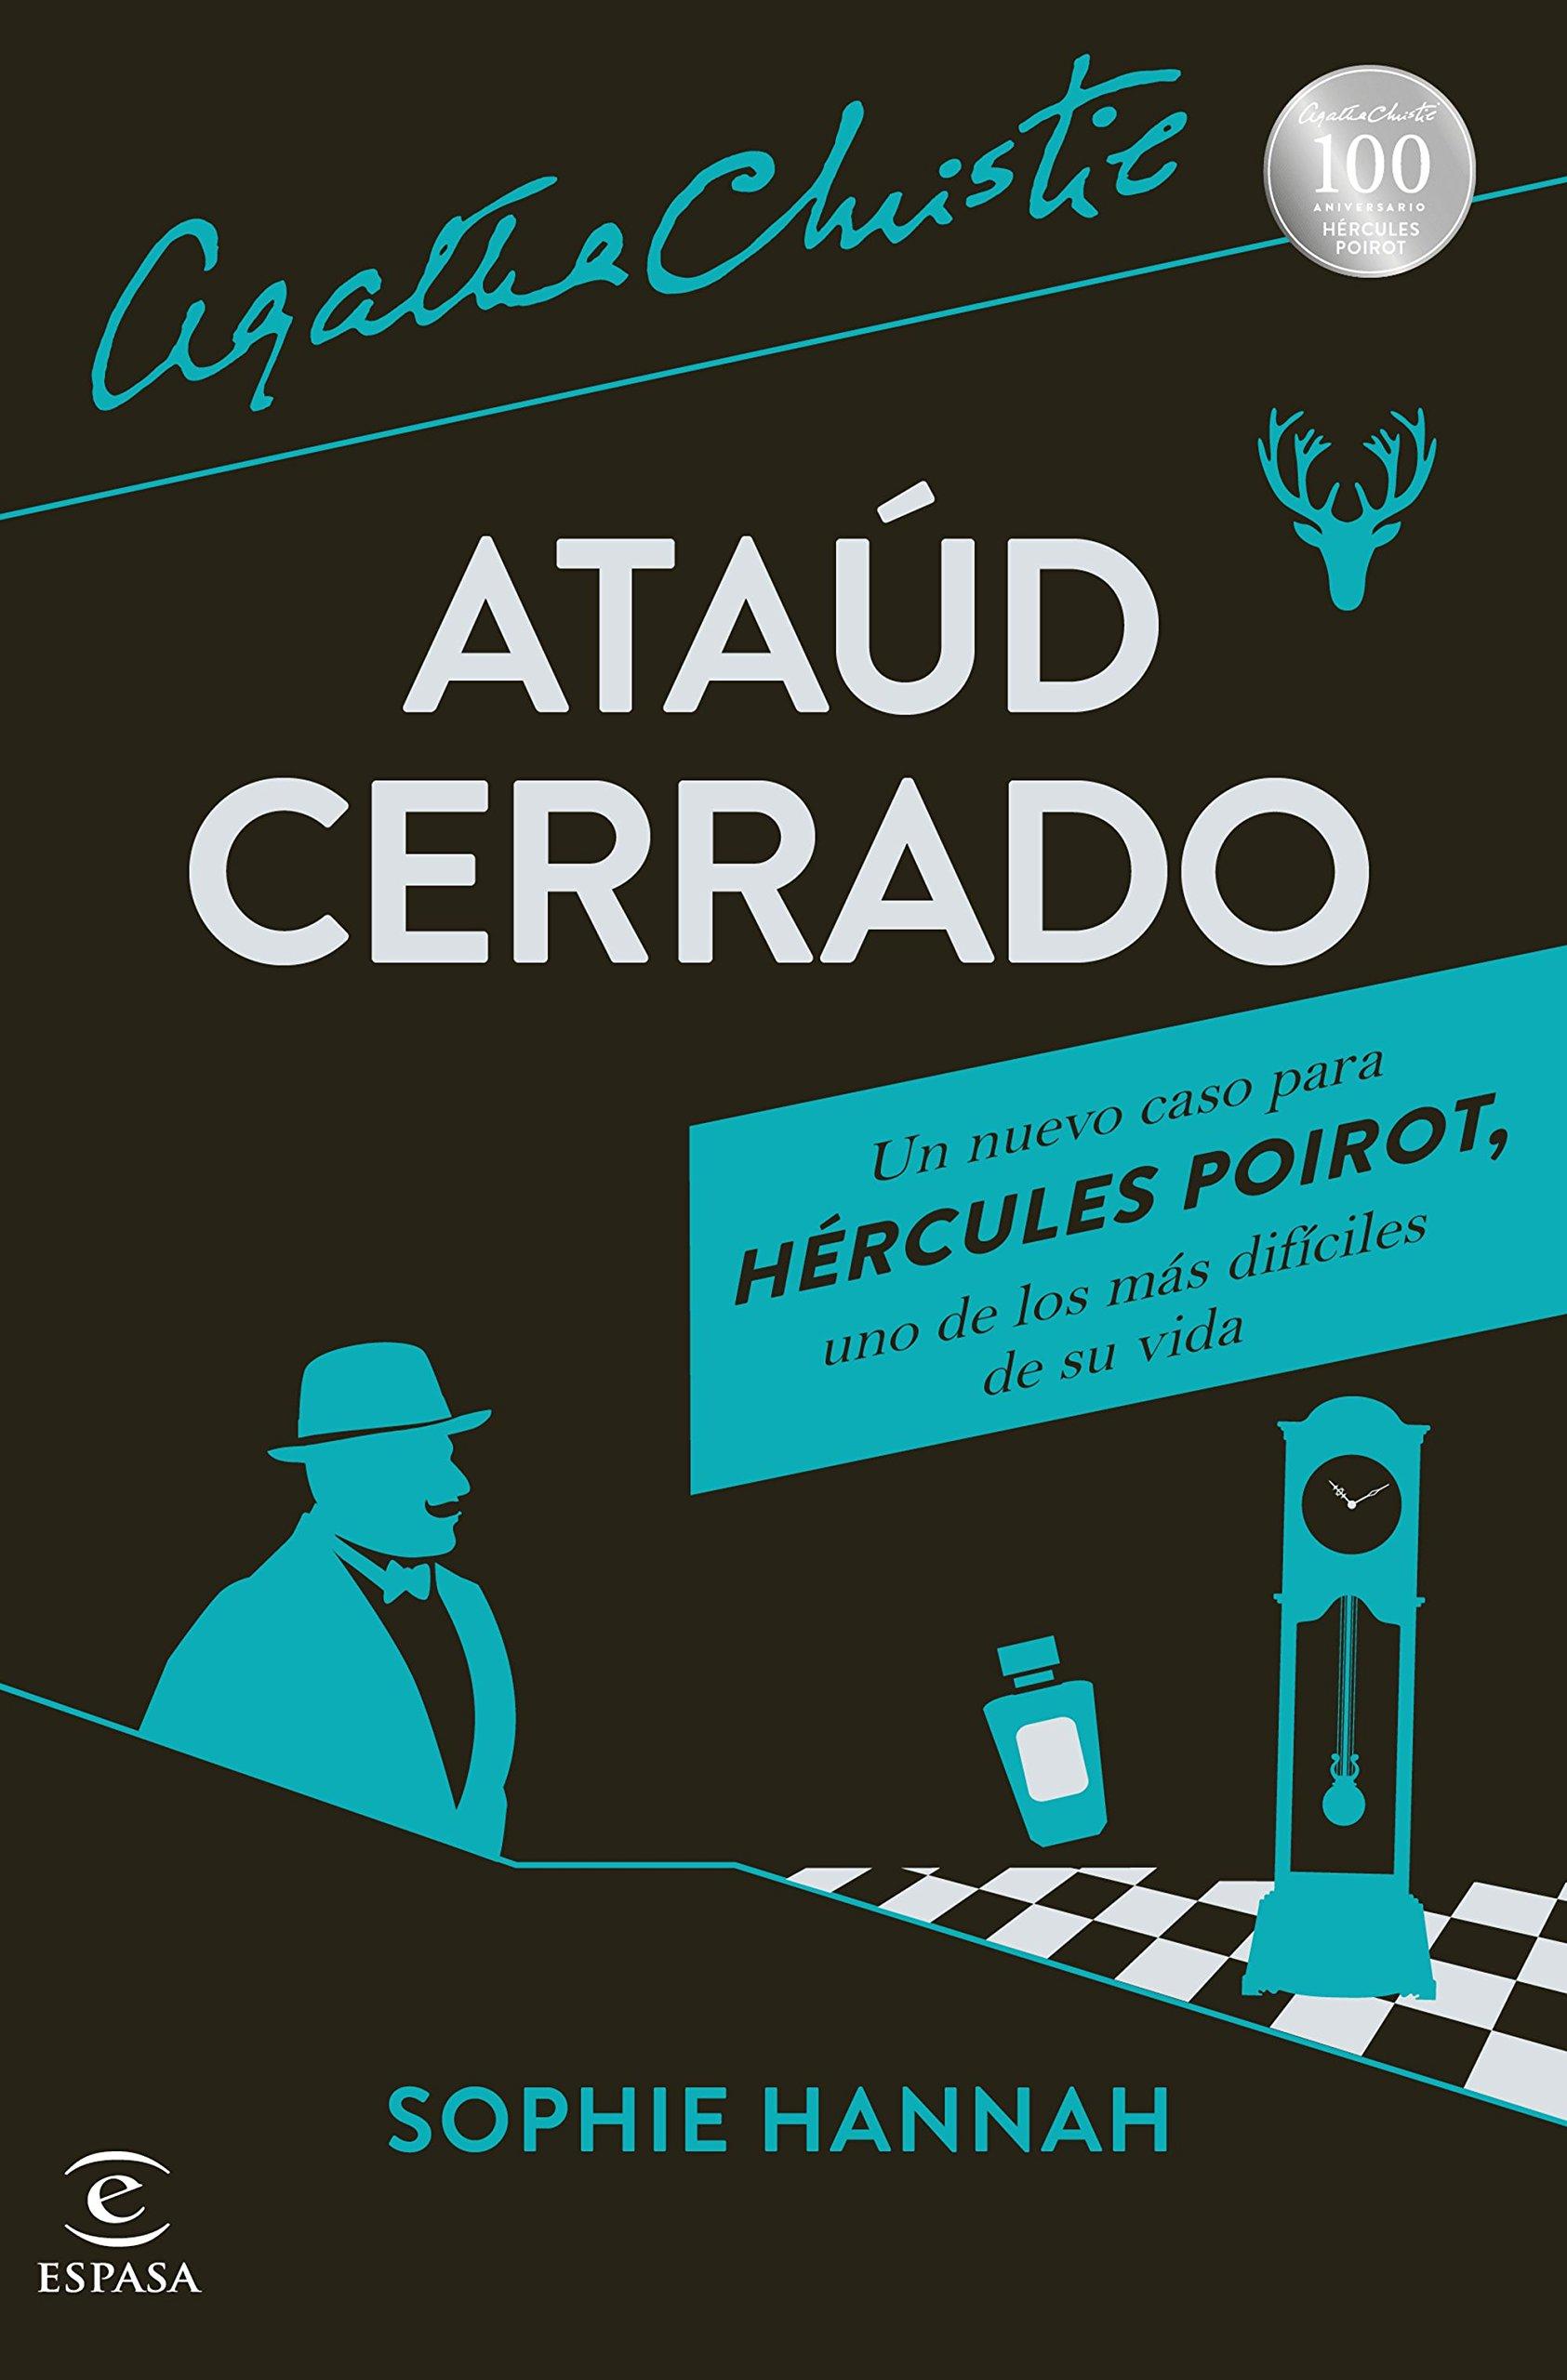 Ataúd cerrado: Un nuevo caso de Hércules Poirot Espasa Narrativa:  Amazon.es: Sophie Hannah, Agatha Christie, Albert Vitó i Godina: Libros